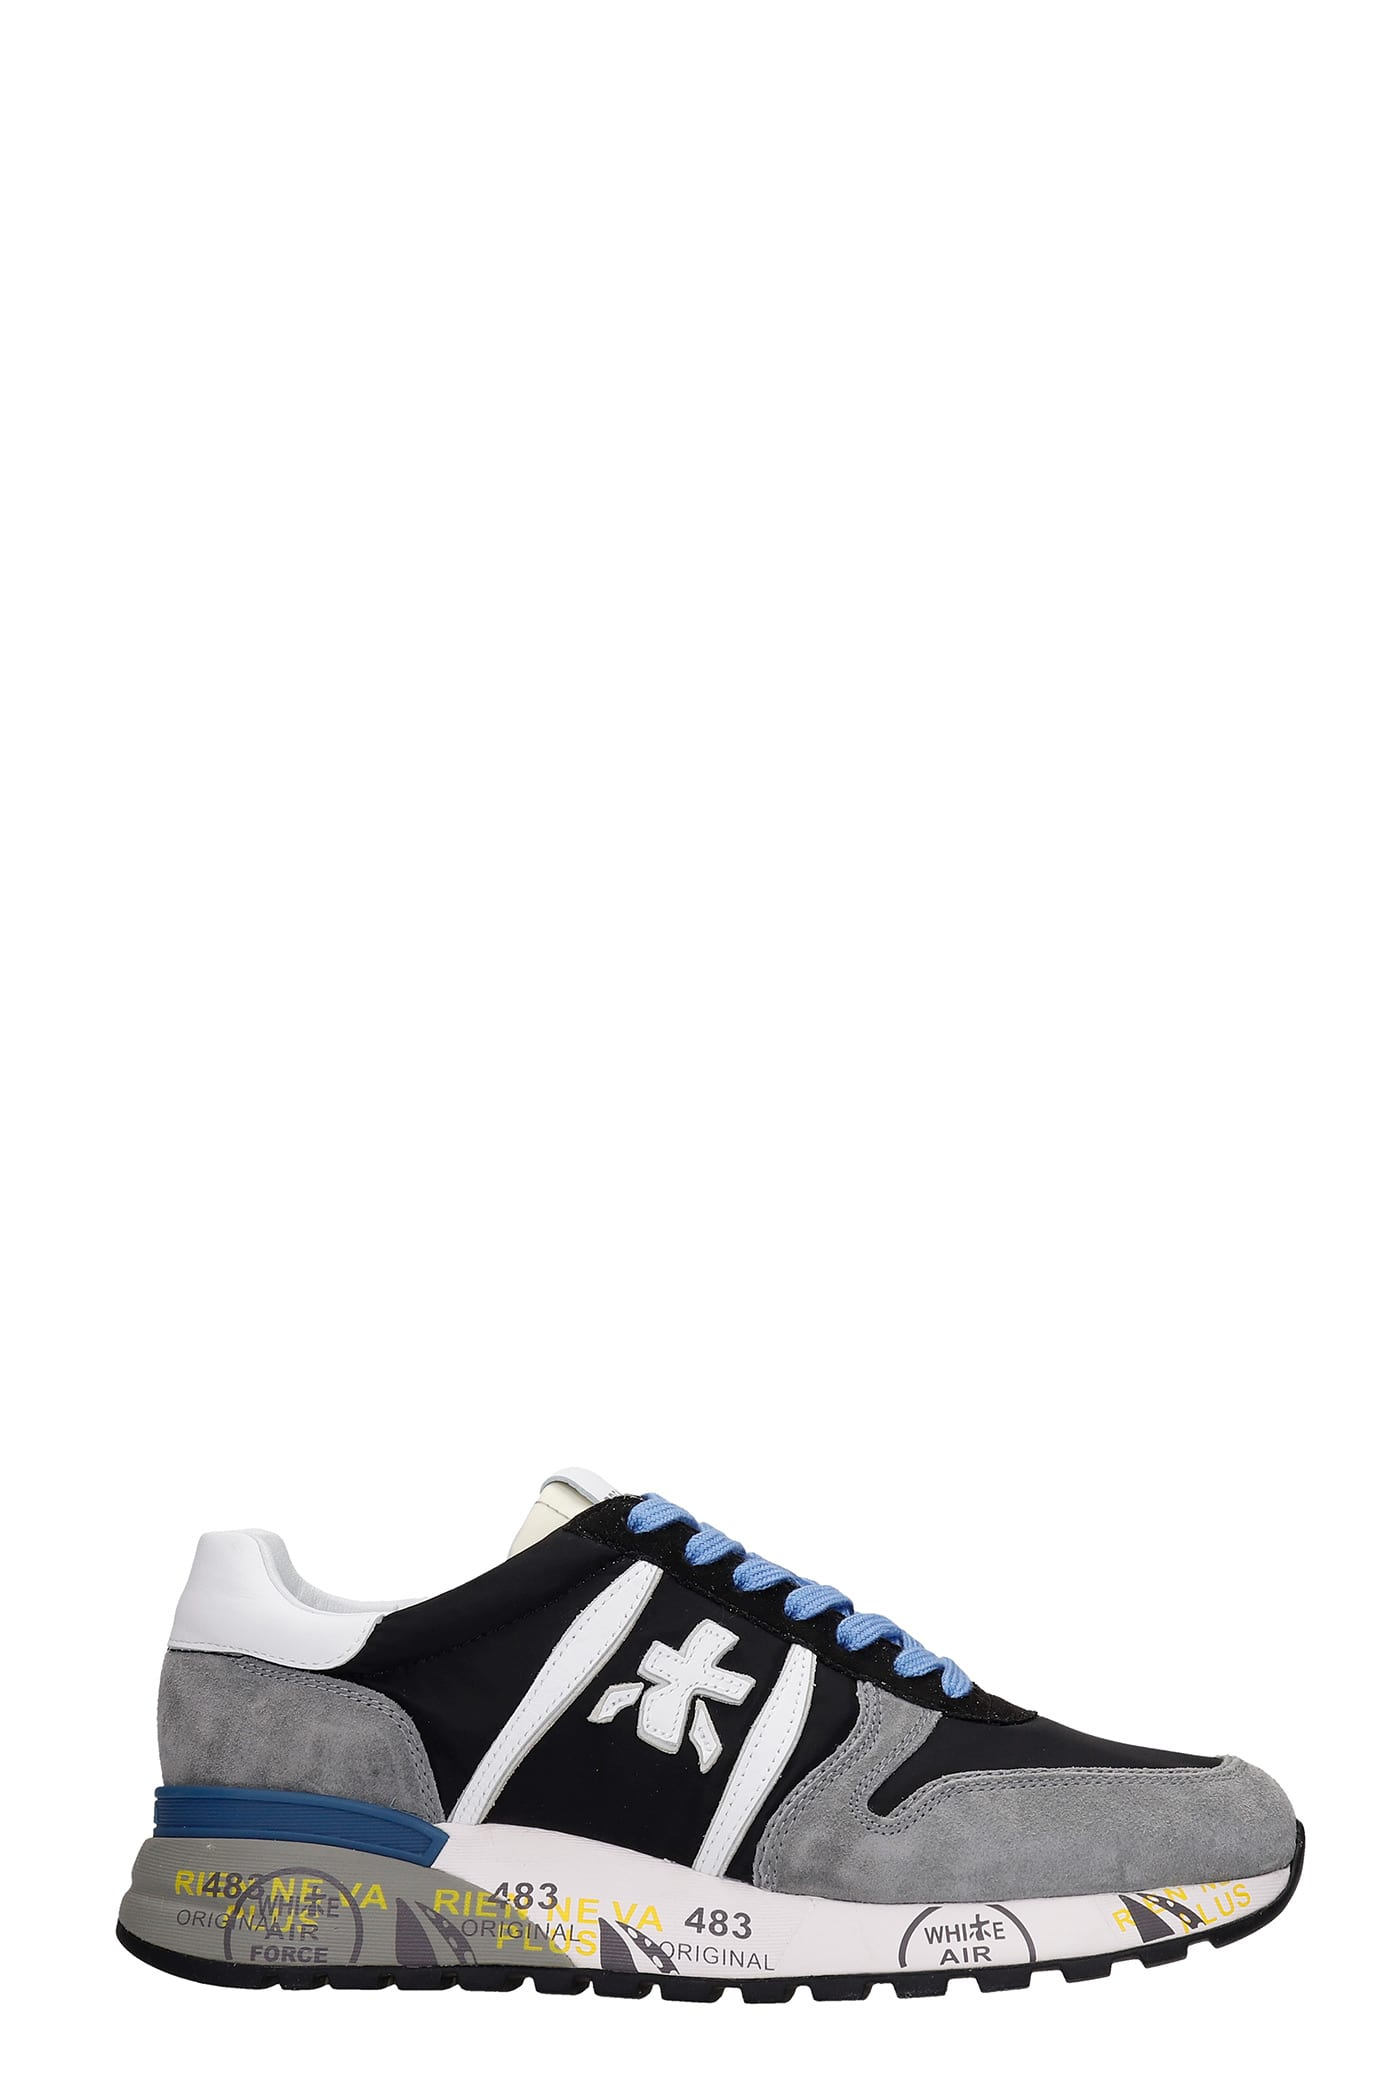 Premiata Sneakers LANDER SNEAKERS IN GREY SUEDE AND FABRIC